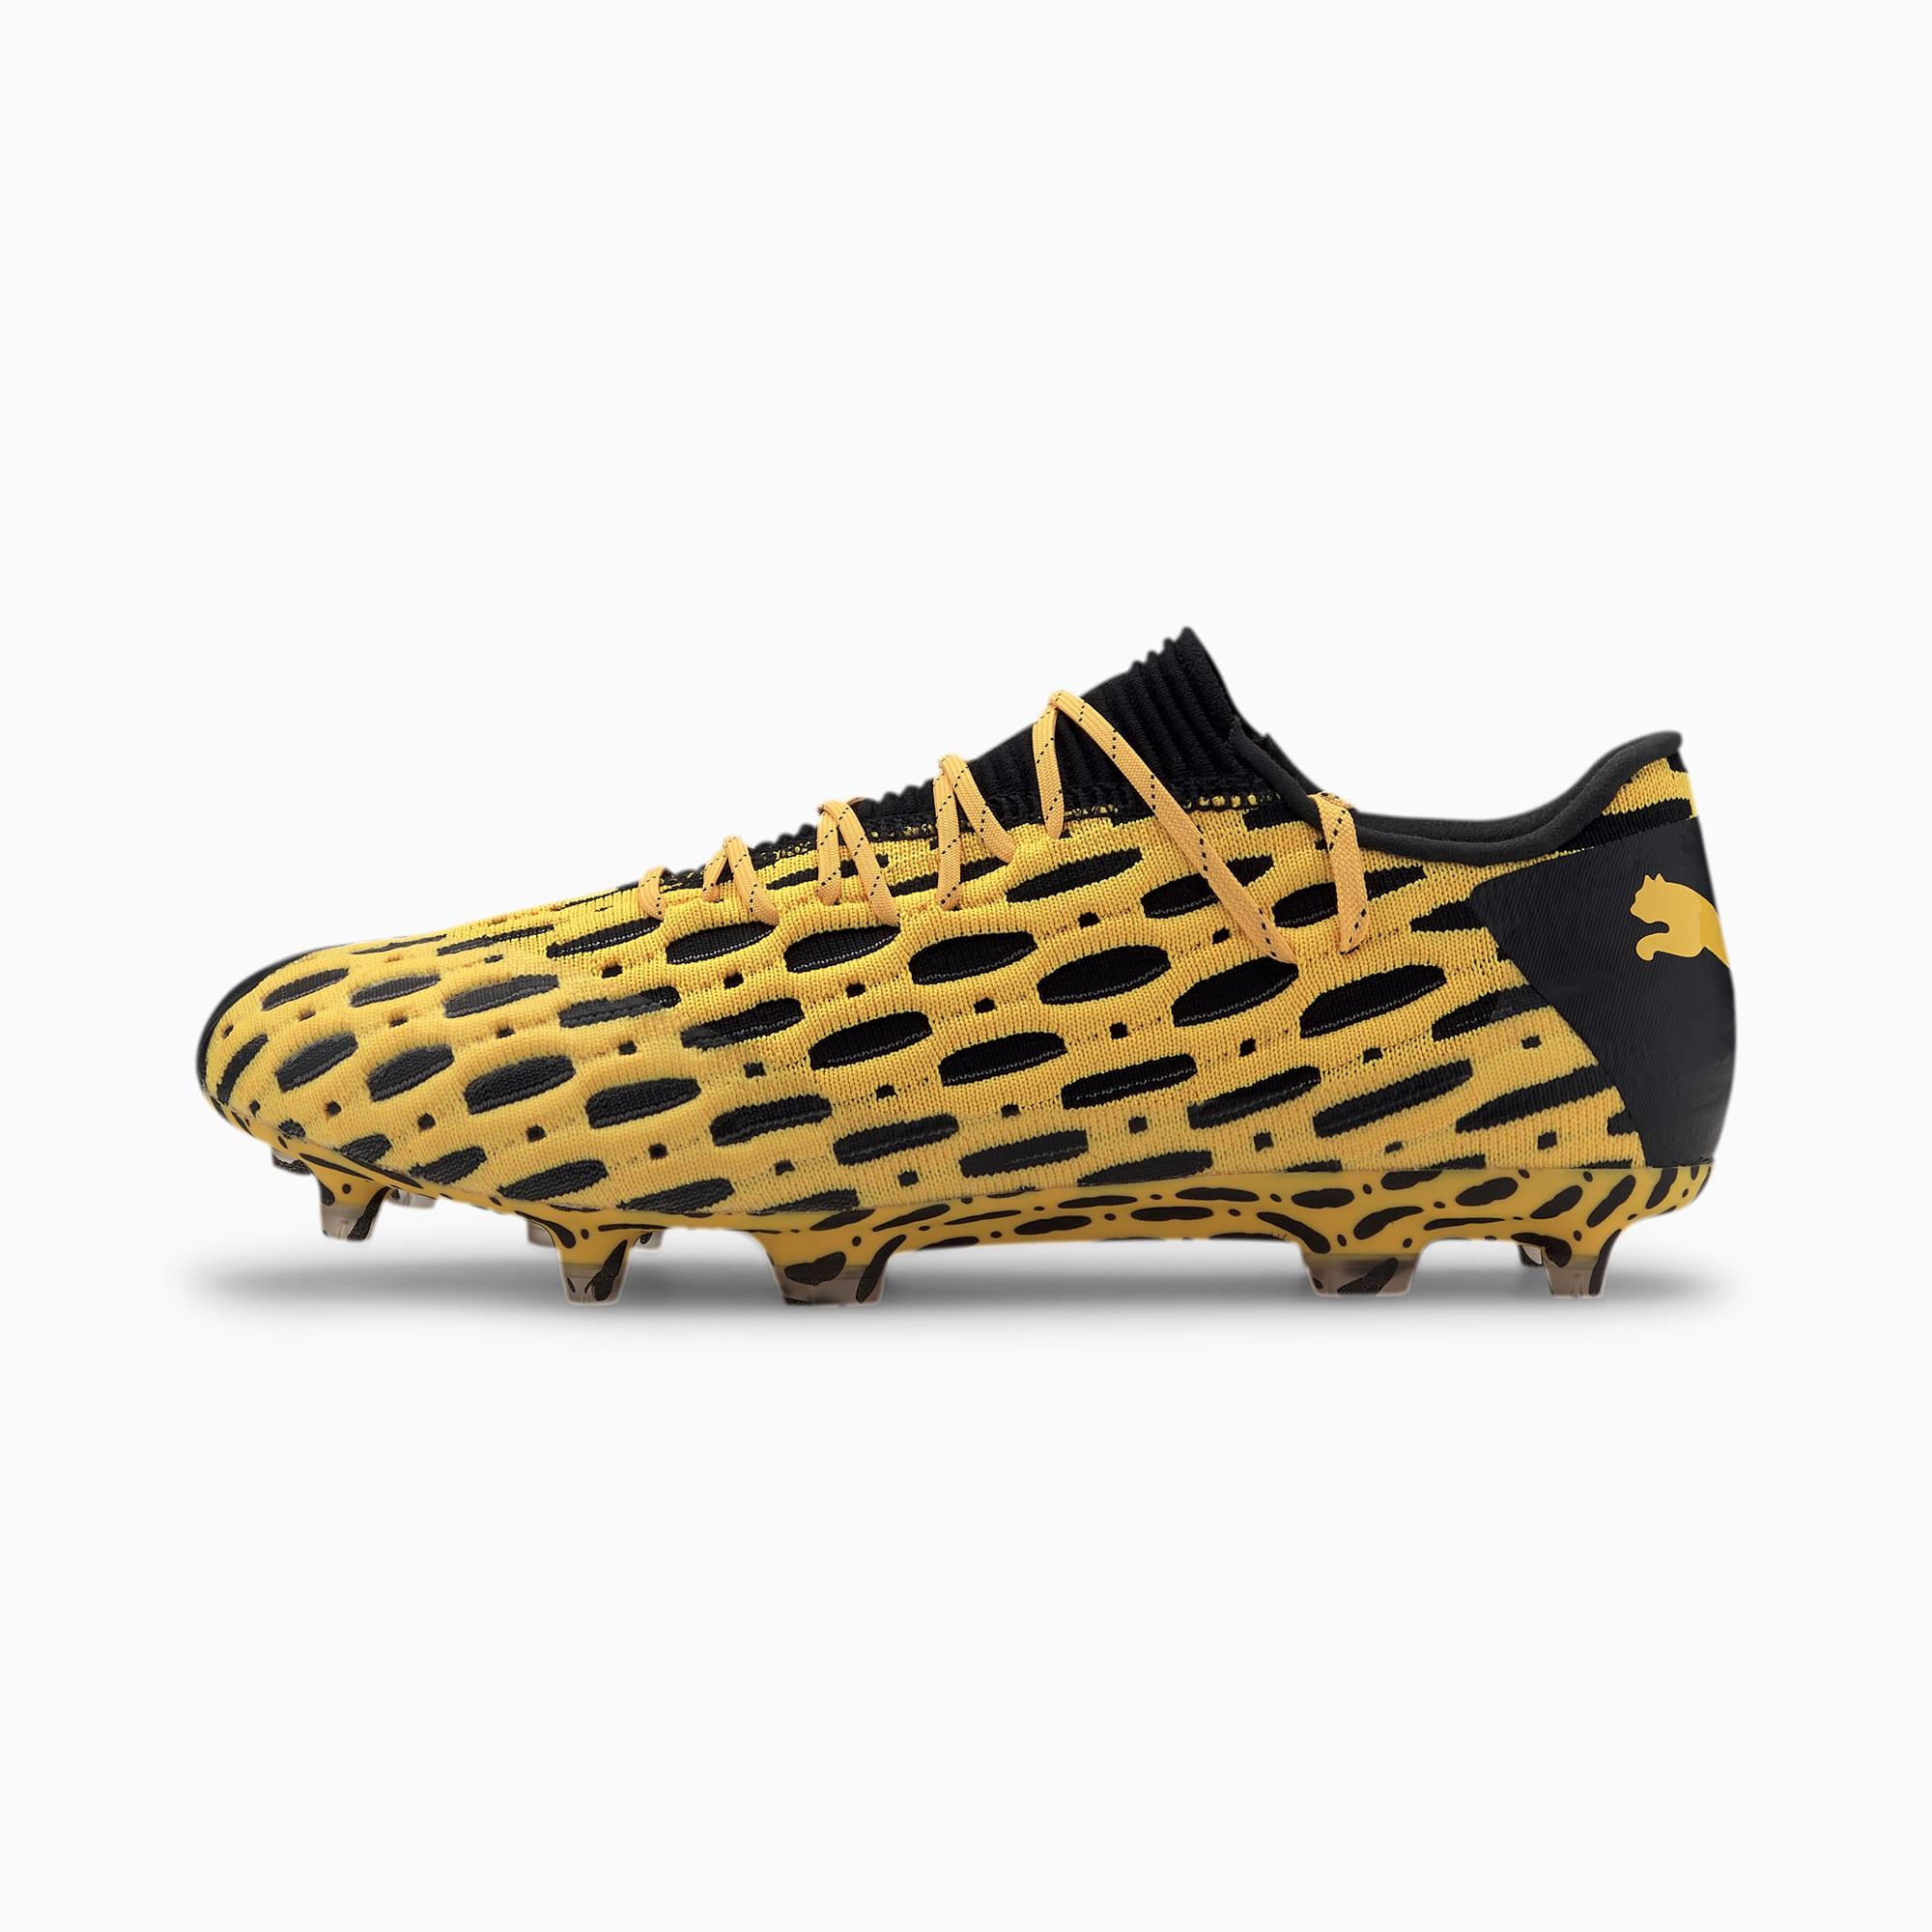 FUTURE 5.1 NETFIT Low FG/AG Men's Football Boots